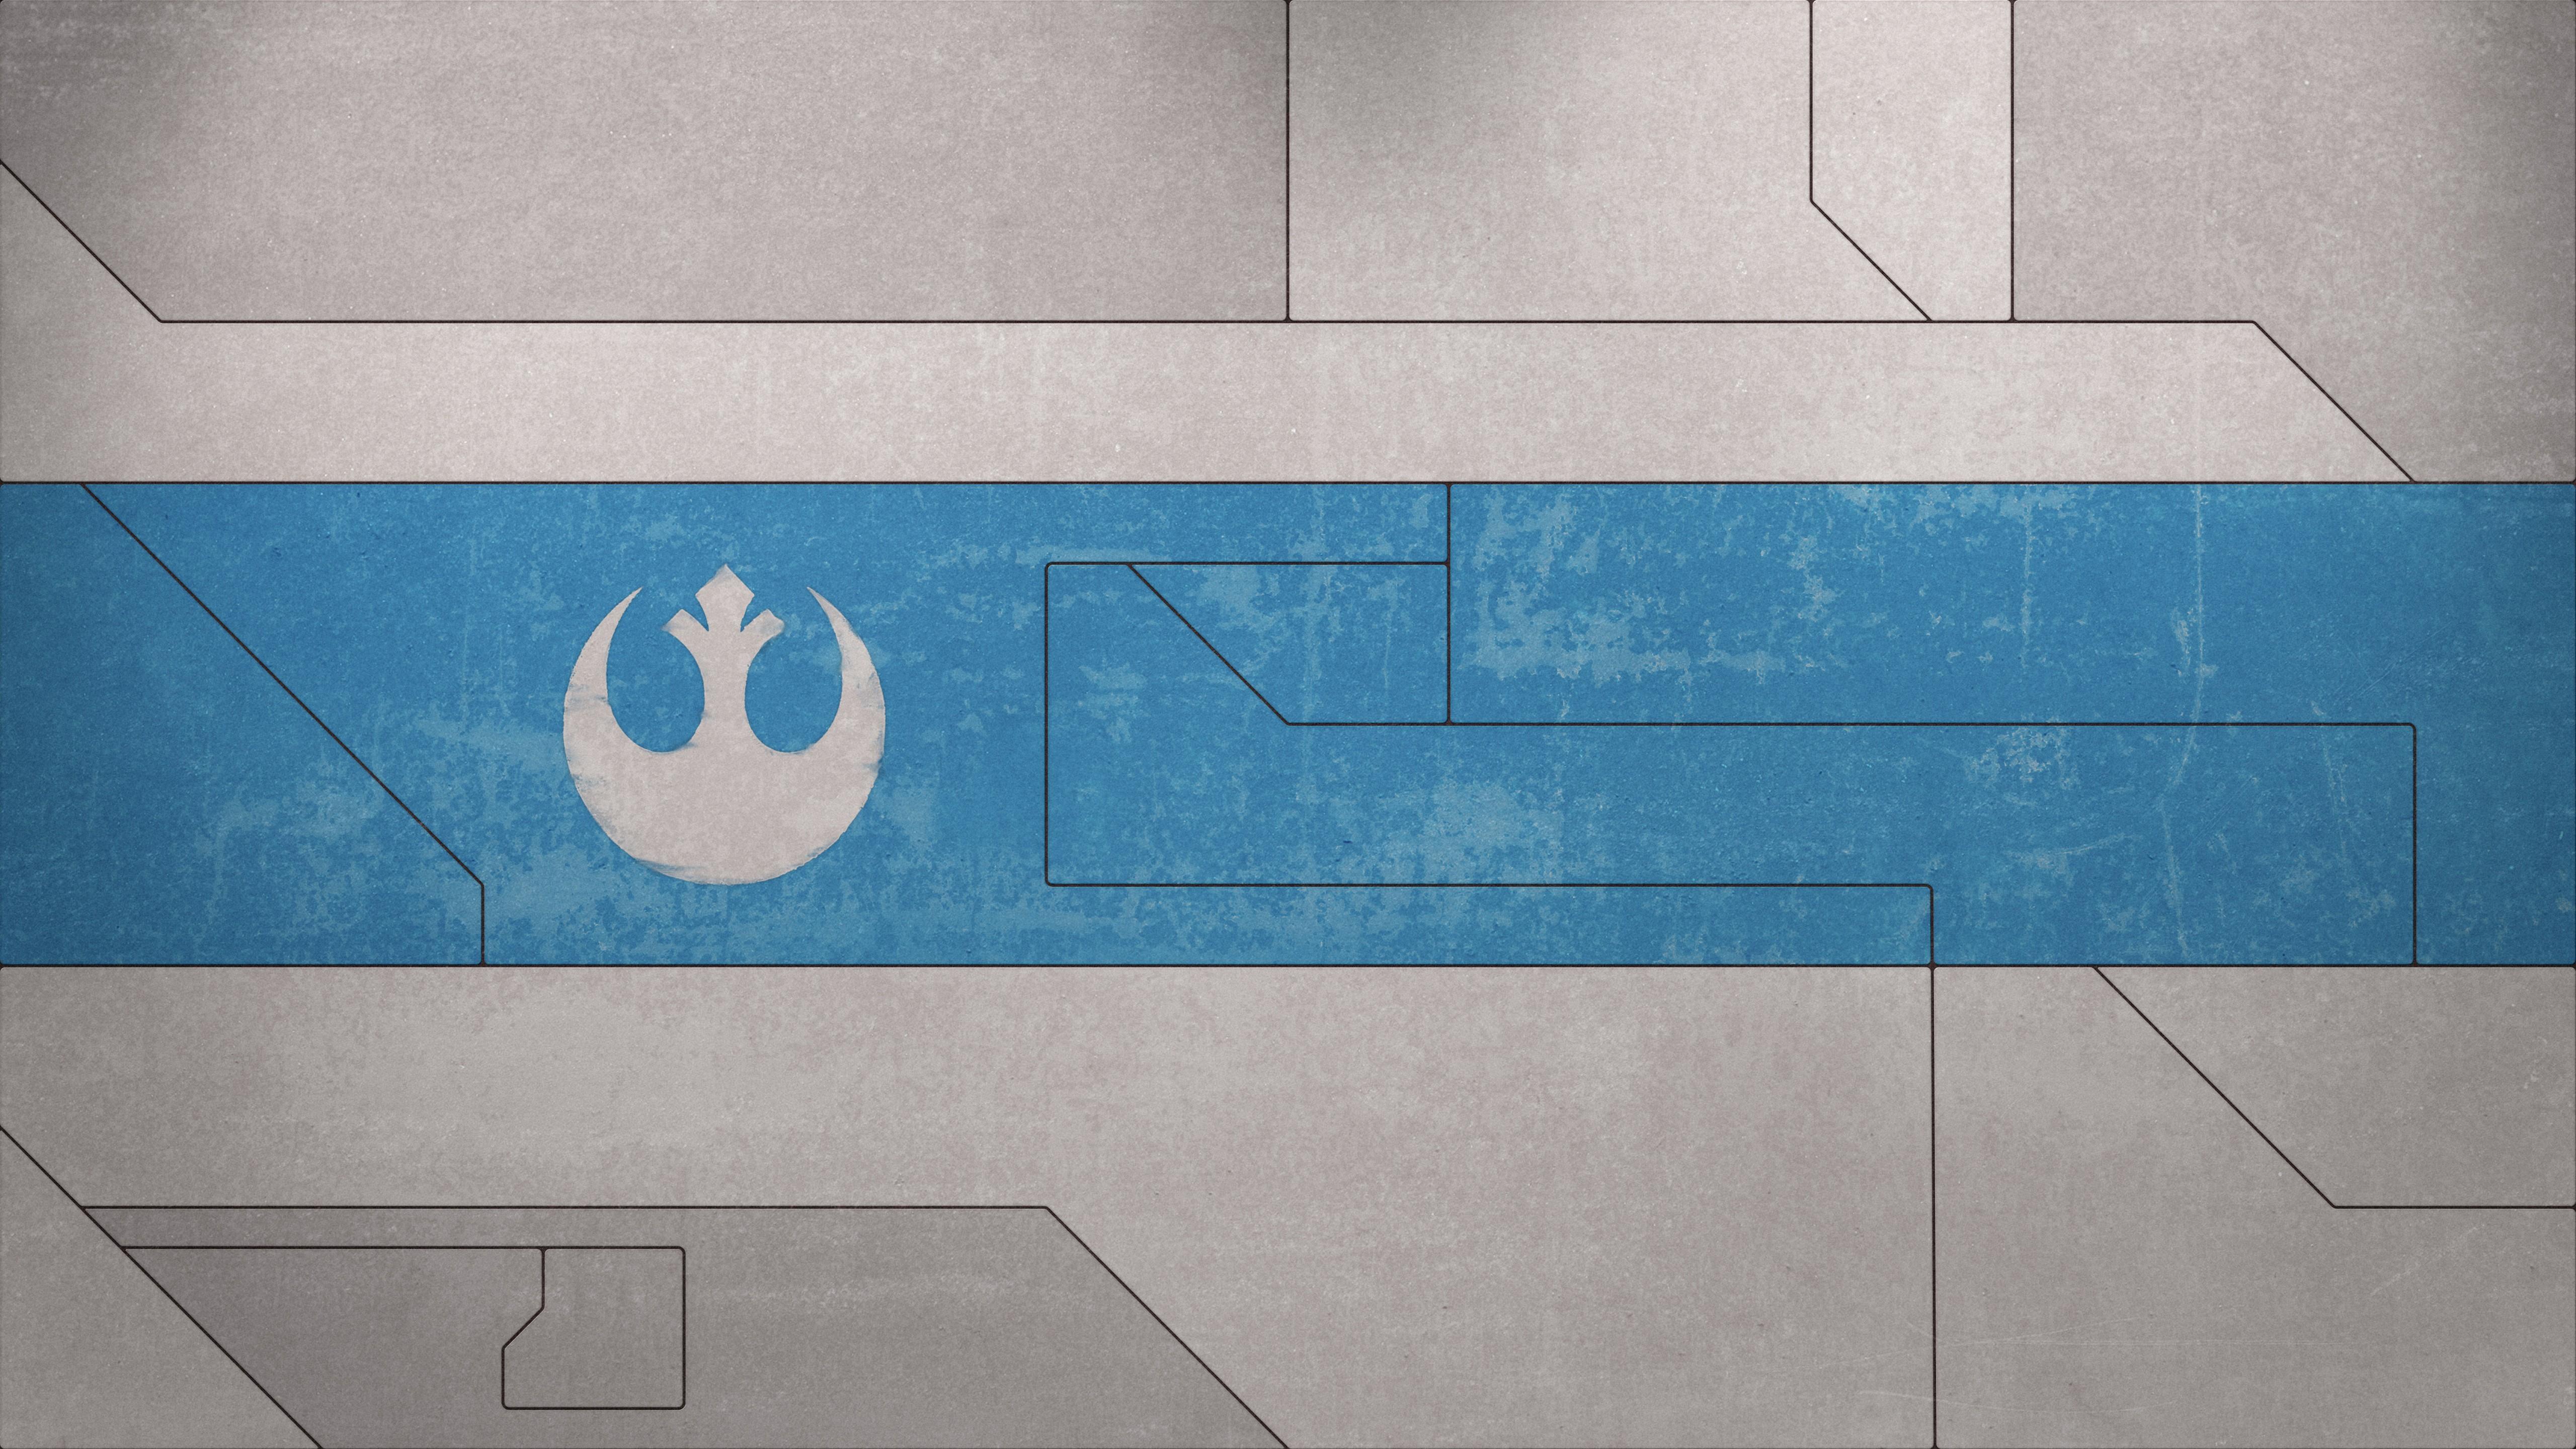 Wallpaper White Star Wars Wall Artwork Green Blue Texture Spaceship X Wing Rebel Alliance Tile Color Shape Design Floor Line Number Flooring 5120x2880 Criseva01 58241 Hd Wallpapers Wallhere